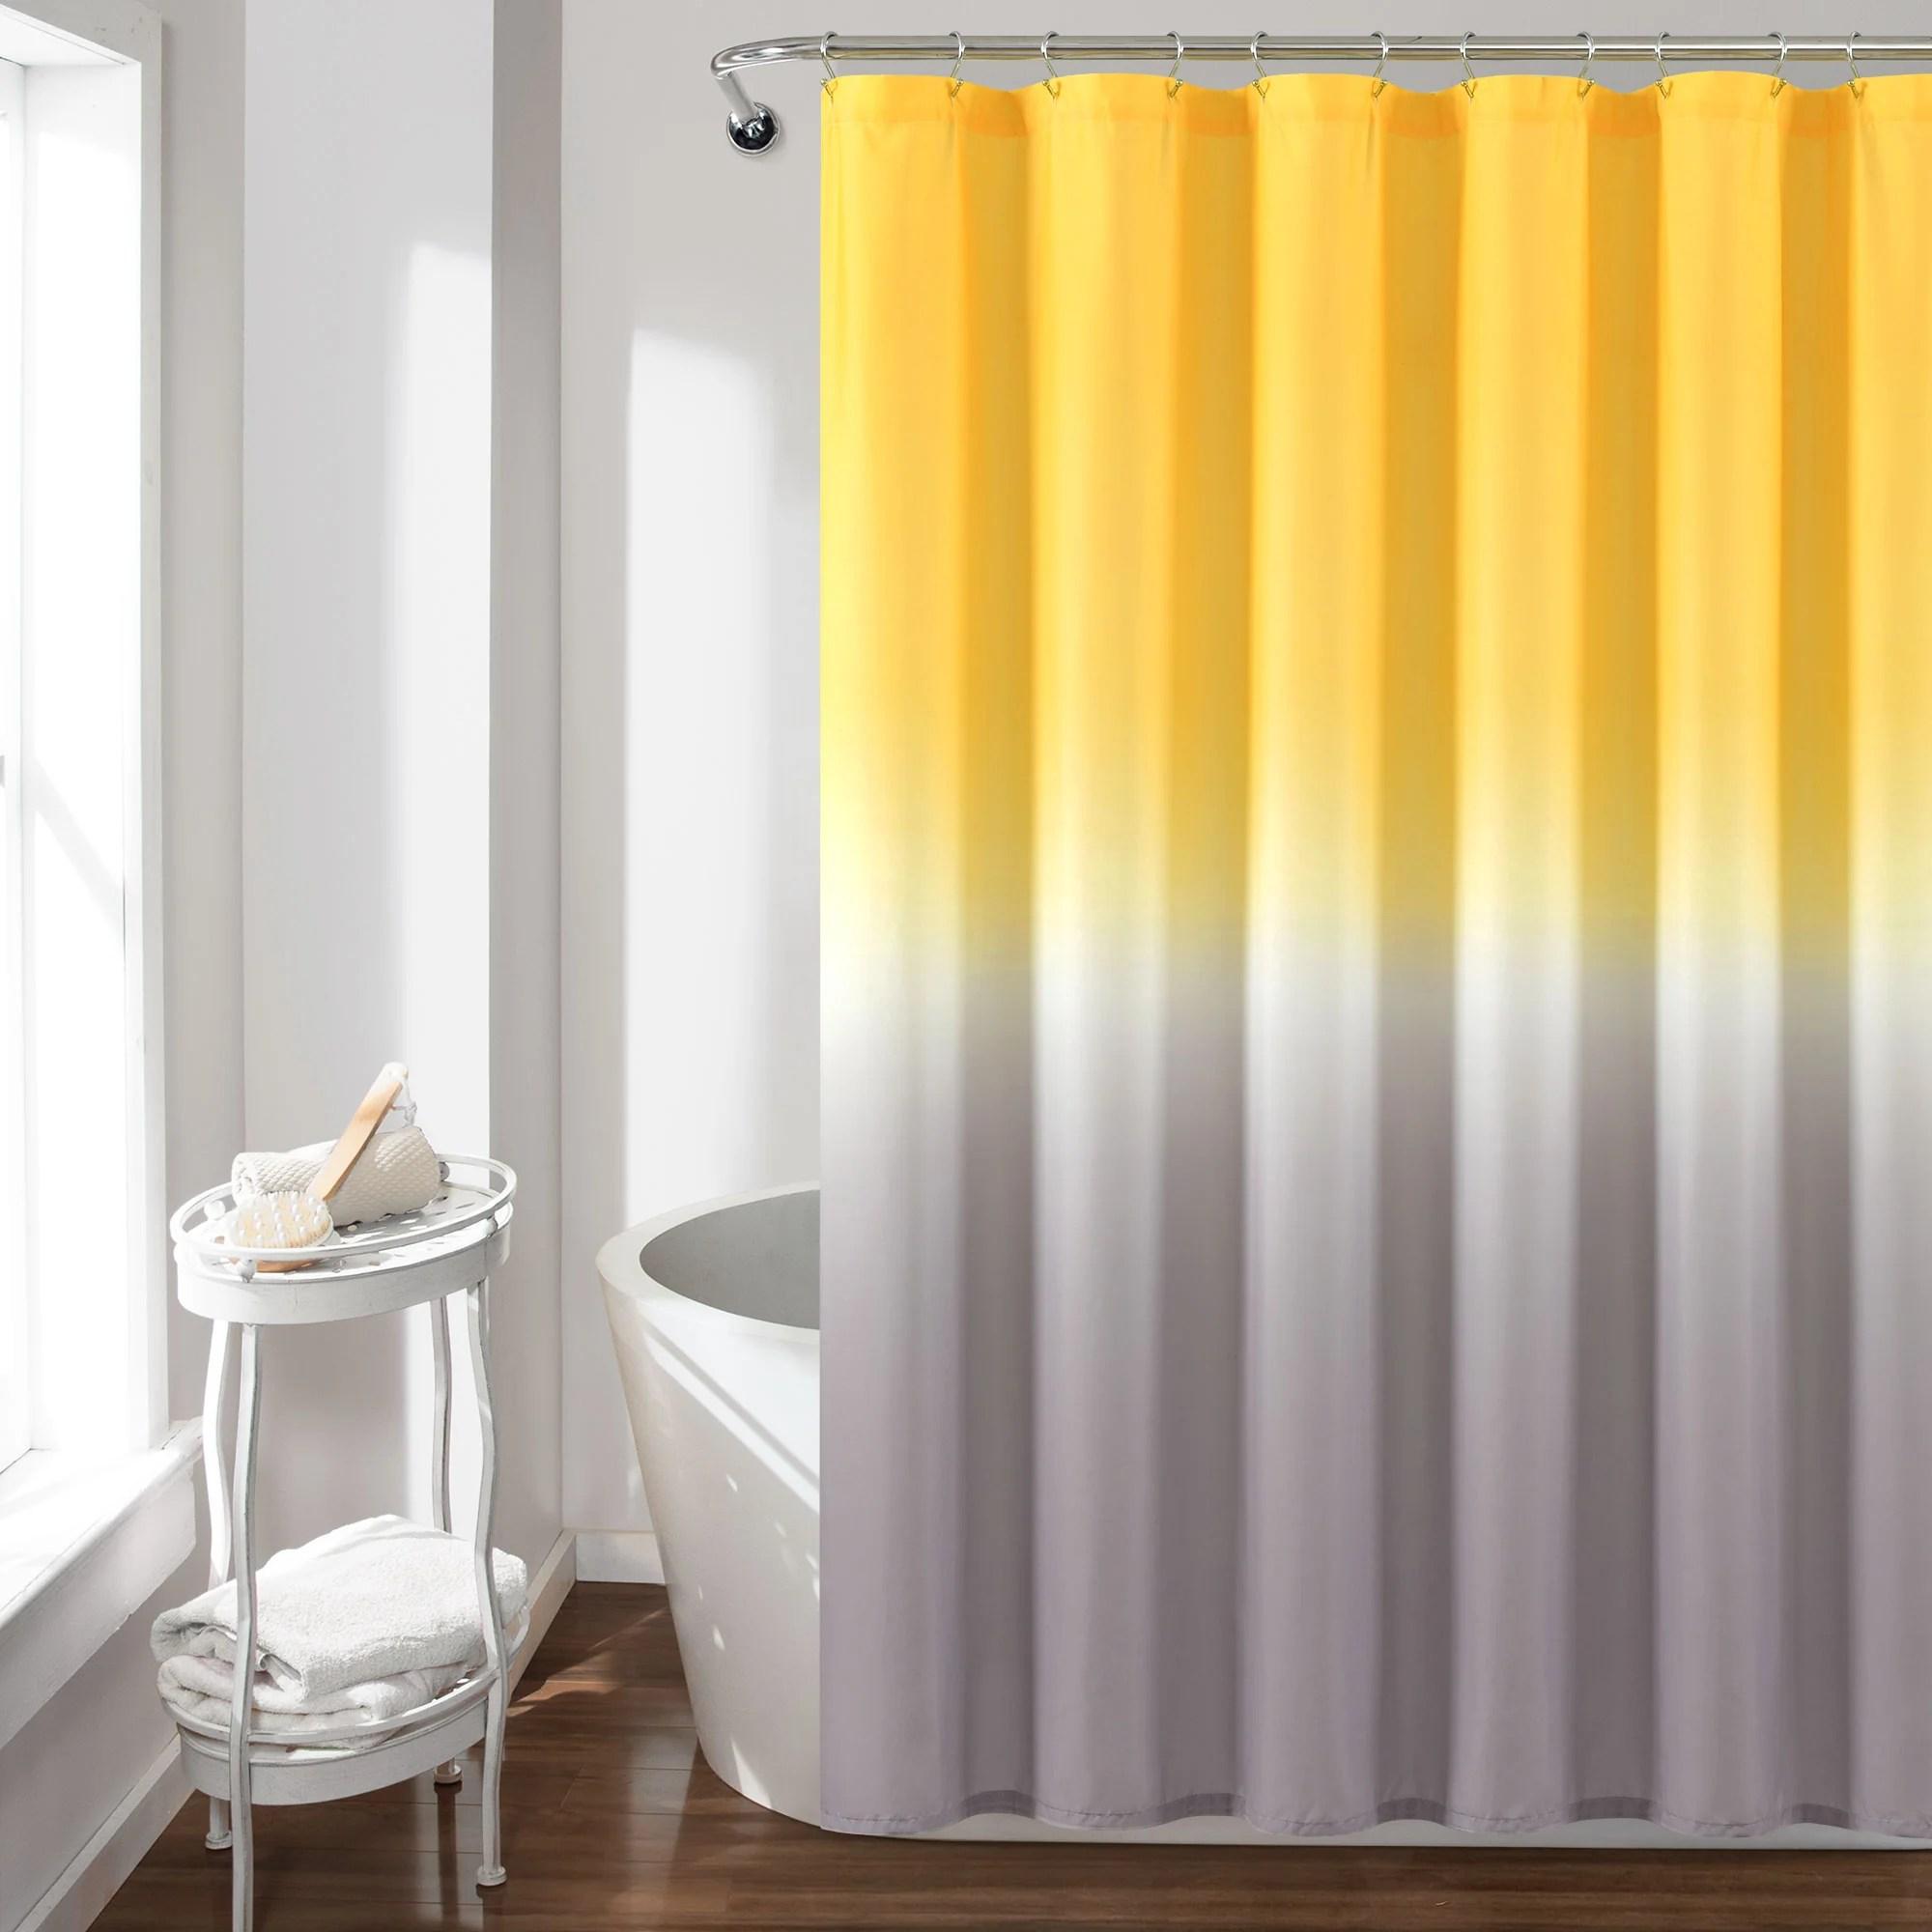 umbre fiesta shower curtain 72 x 72 yellow gray